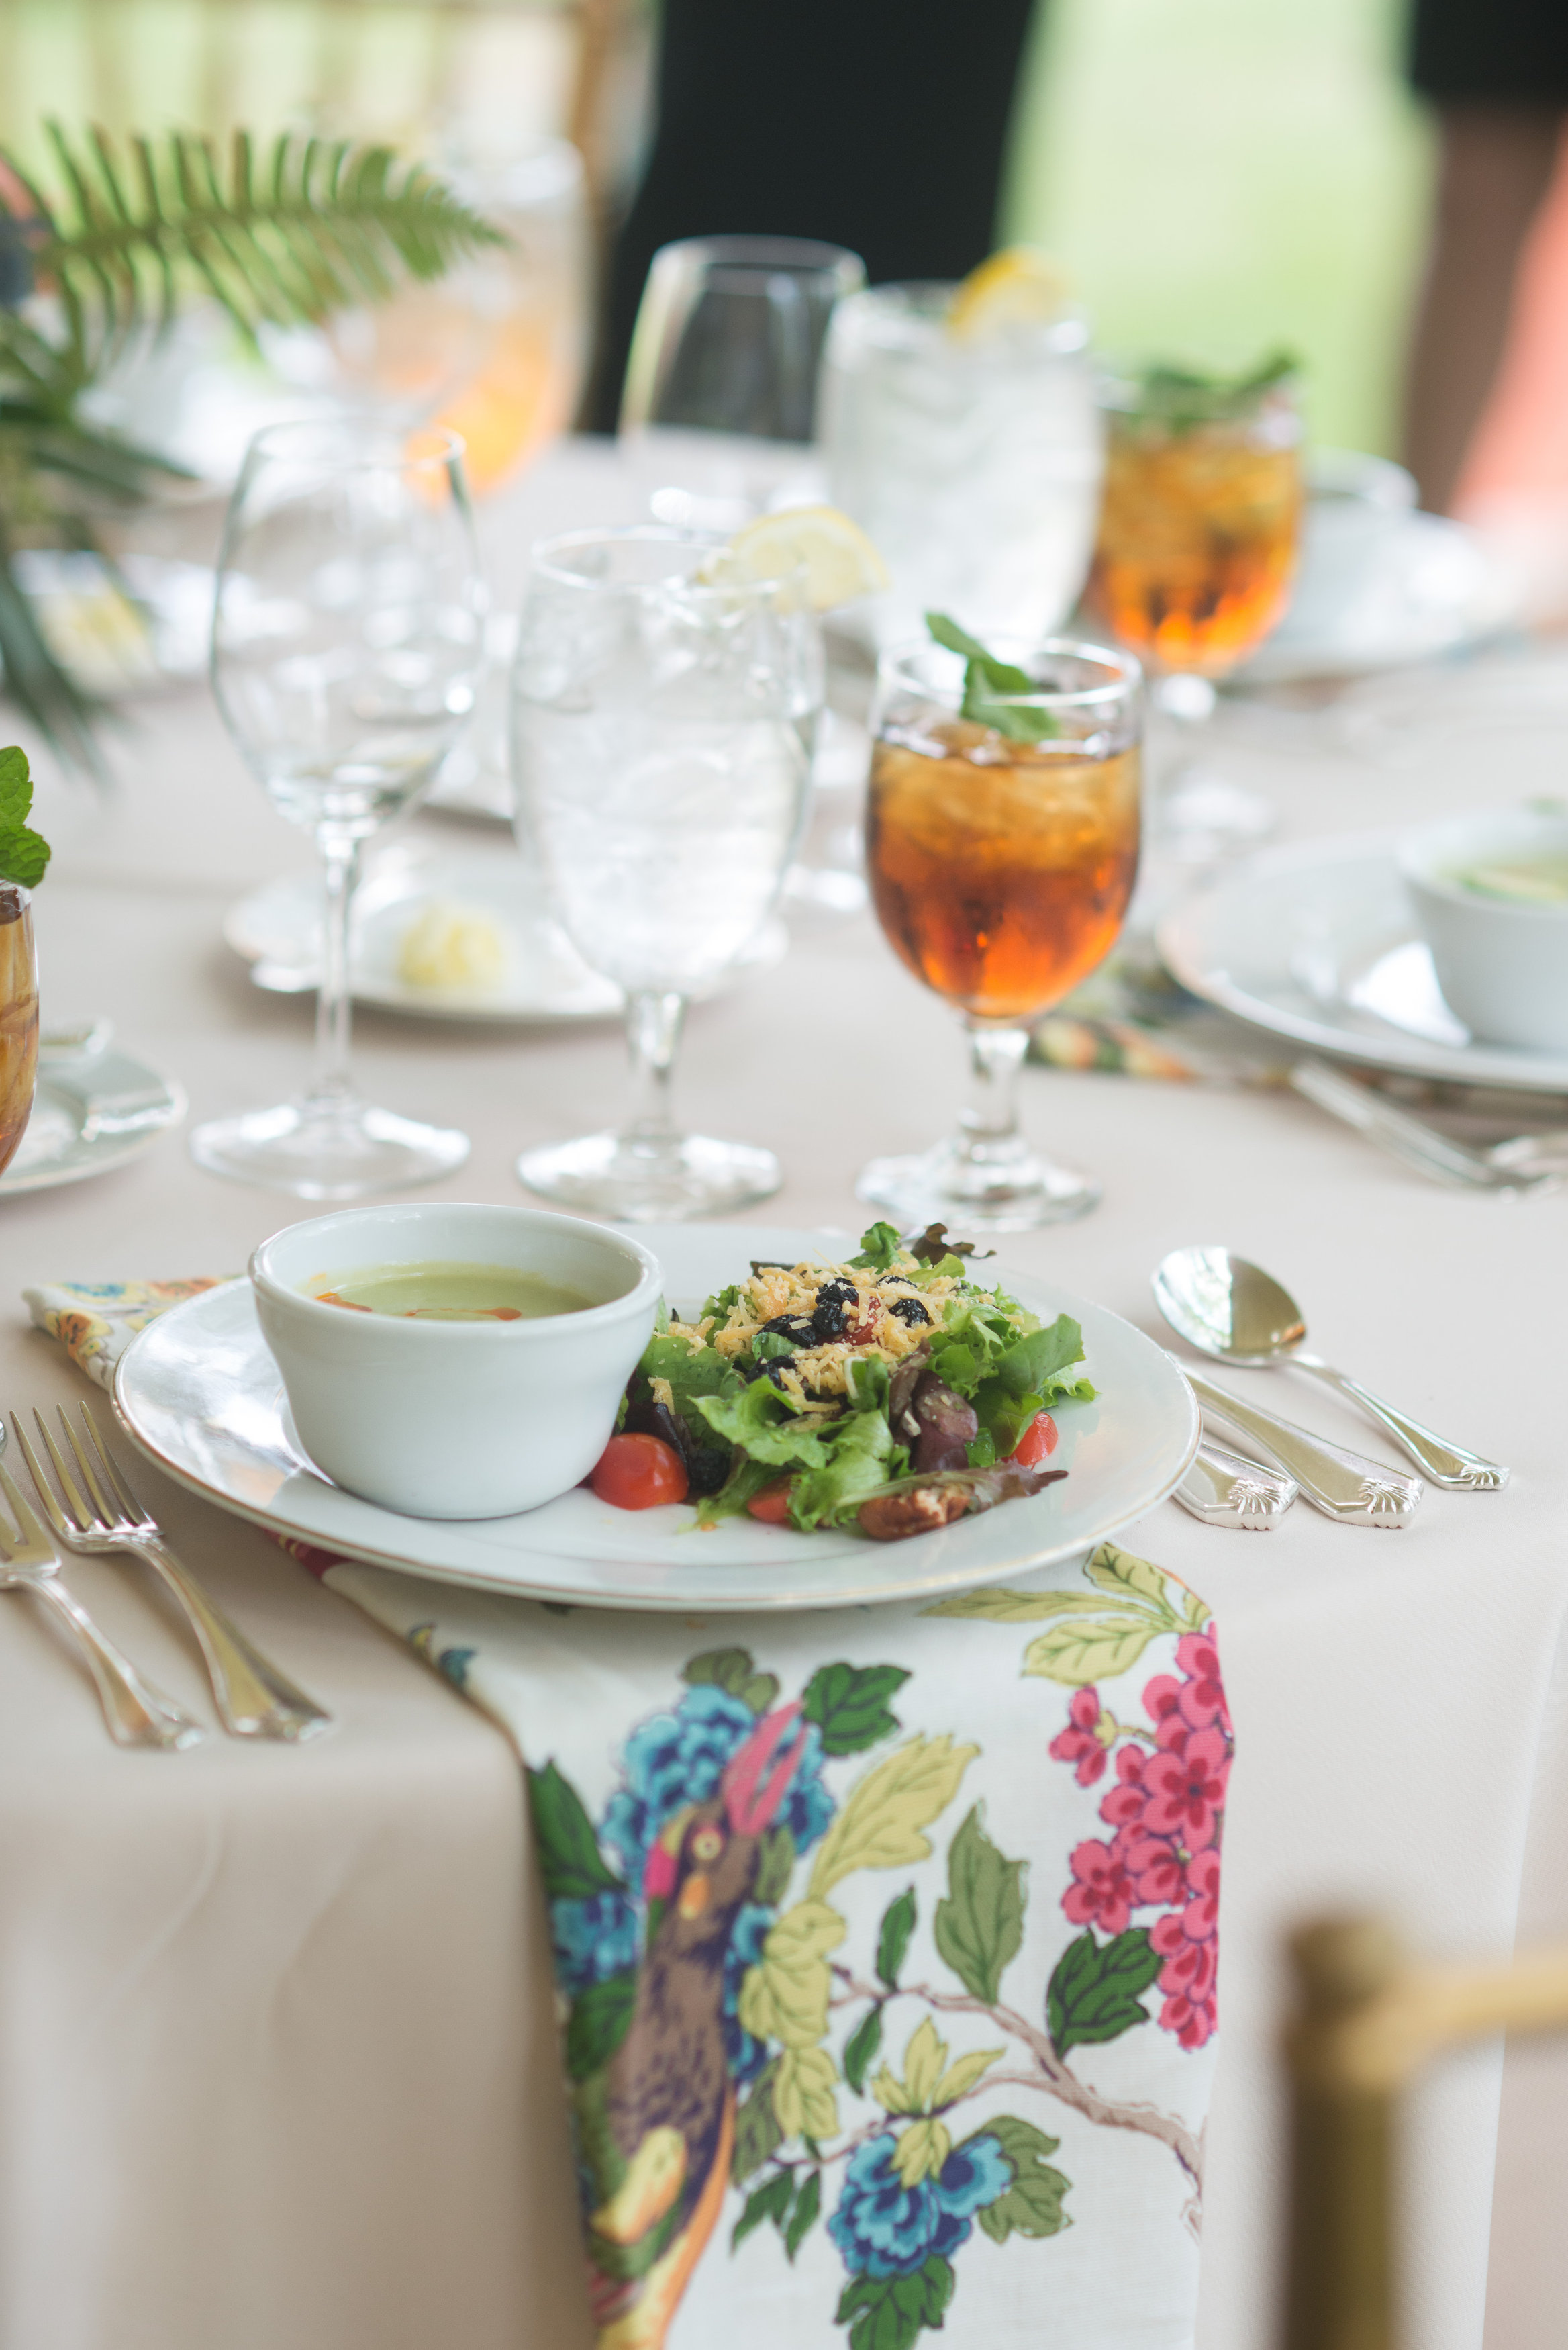 2015 cucumber avocado soup & salad.jpg